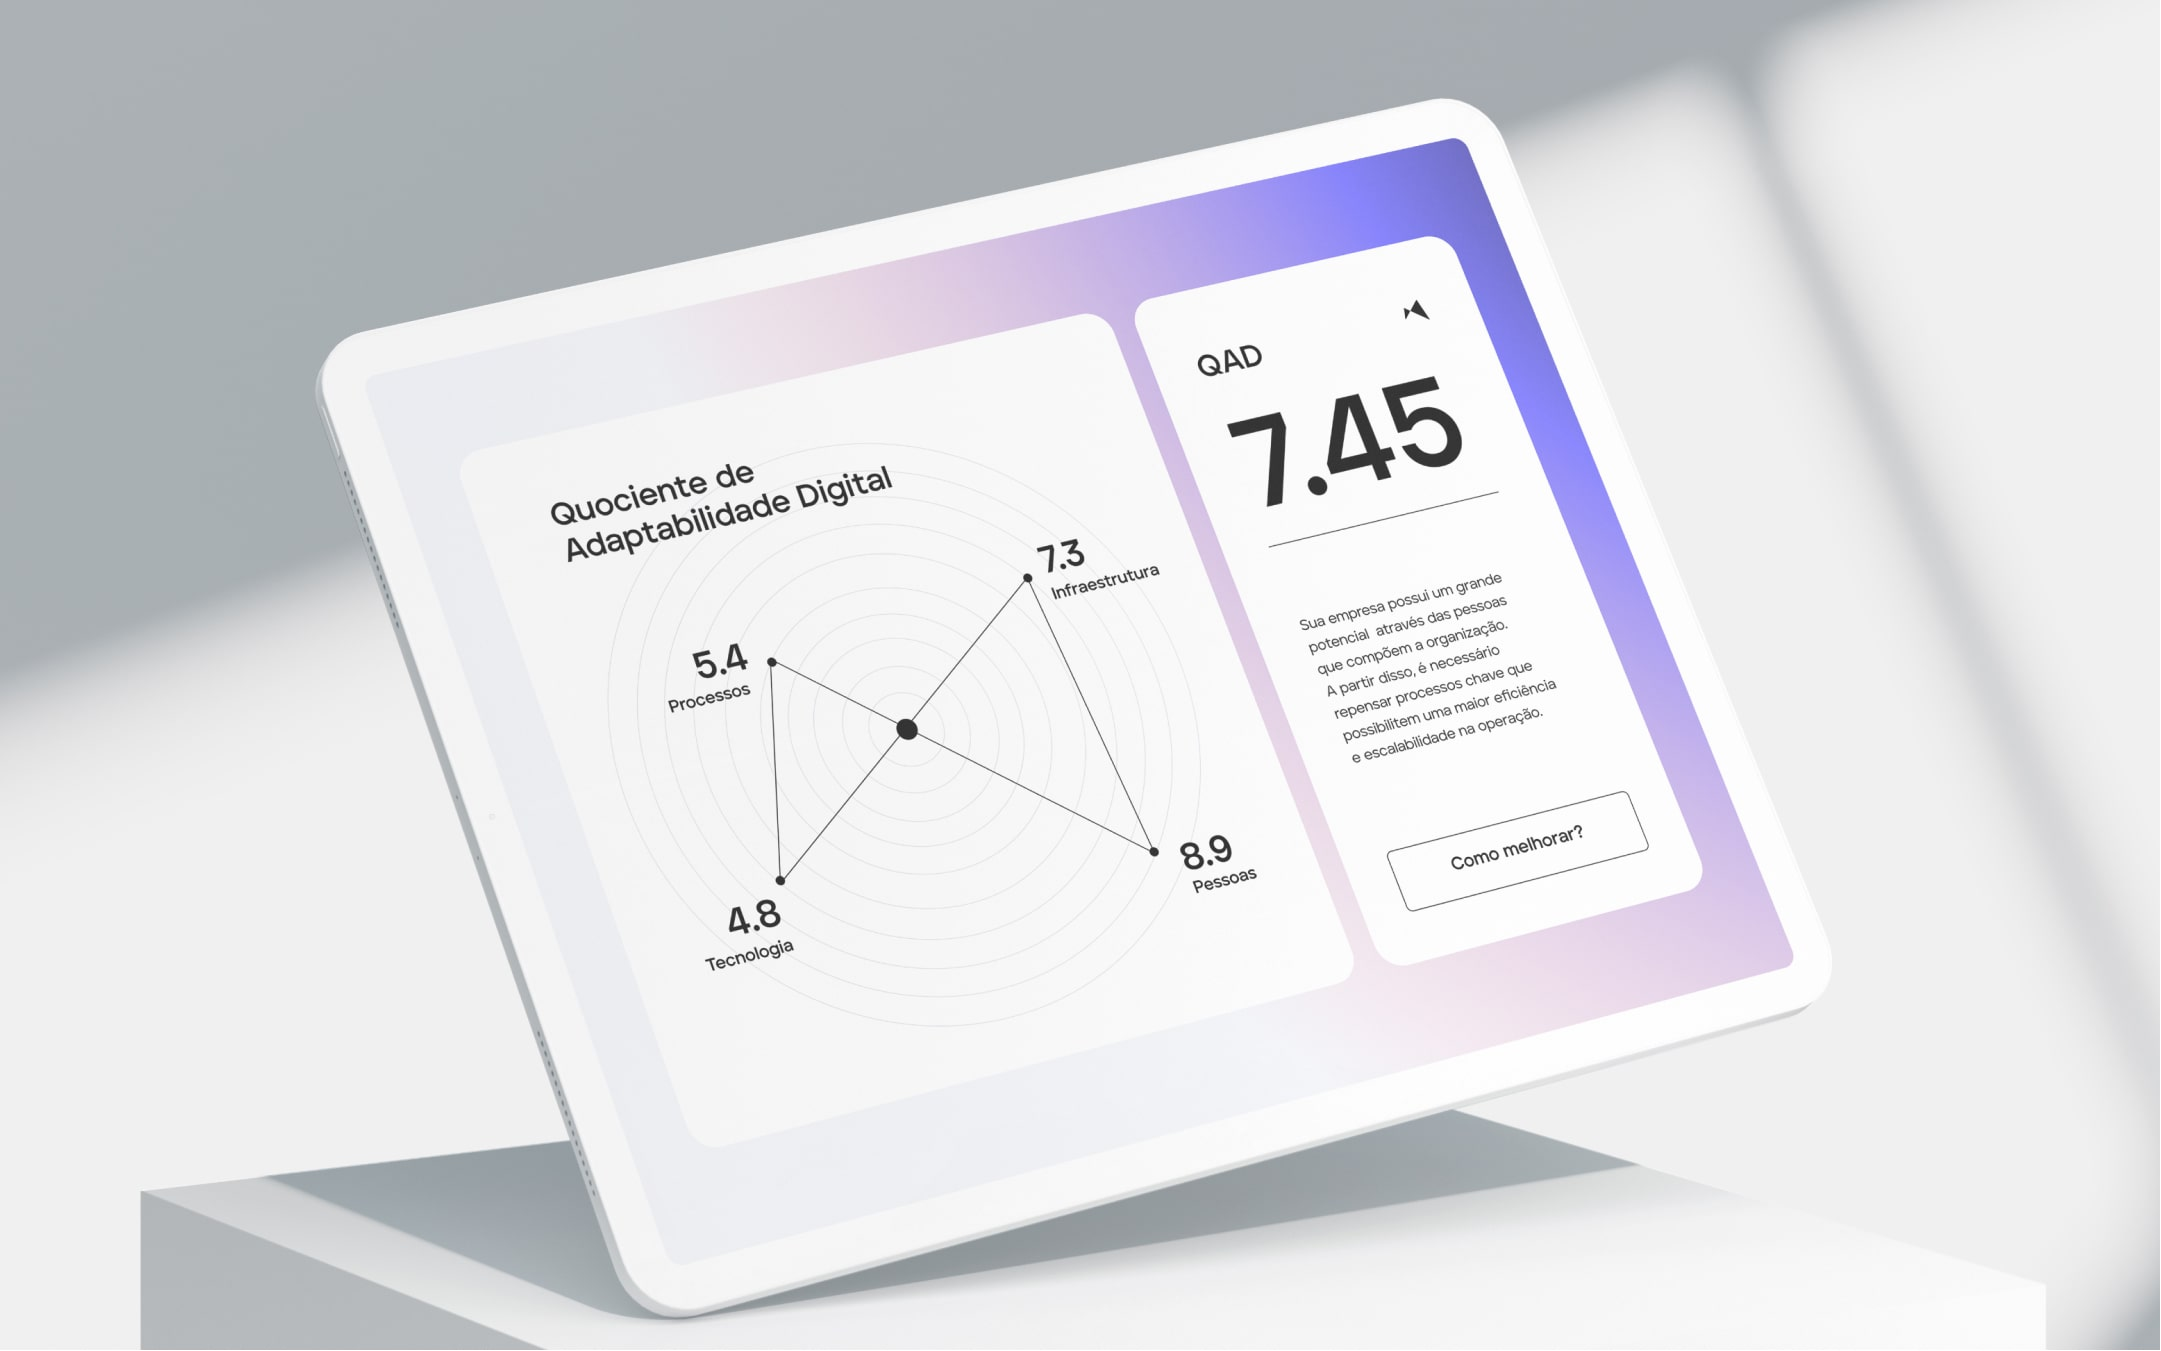 Mageda-Branding-brandupgrade-Design-Brand-Upgrade-Consulting-b2b-min